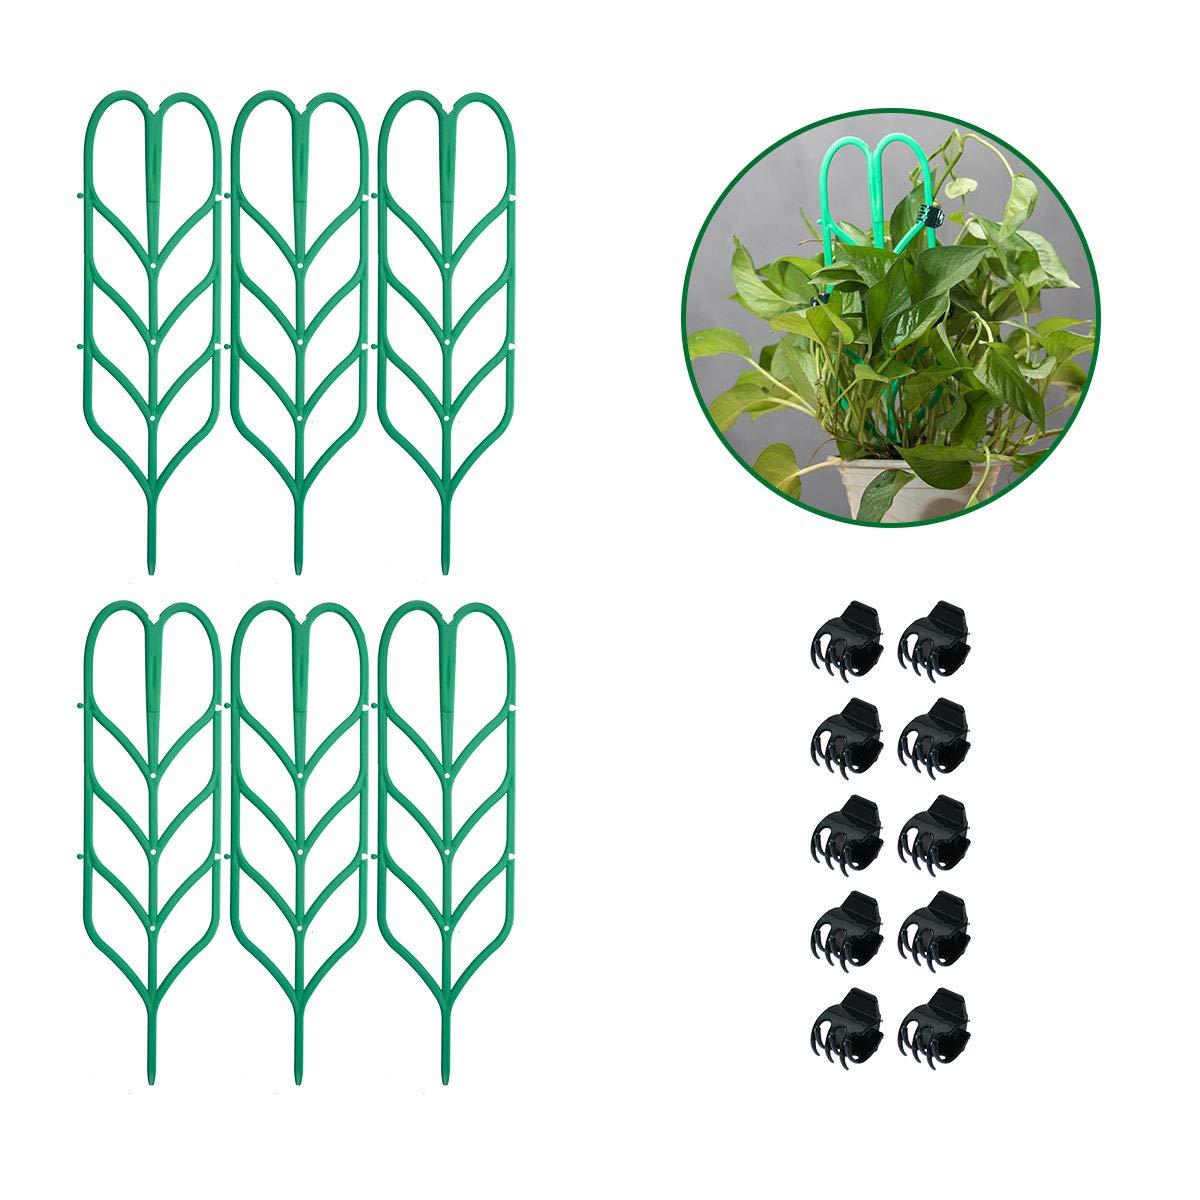 Vasdoo Indoor Plant Trellis 6 Pcs Garden Trellis DIY for Potted Plant Support, 10 Pcs Plant Clips,Leaf Shape Mini Climbing Plants Flower Vegetables Rose Vine Pea Ivy Cucumbers Pots Support